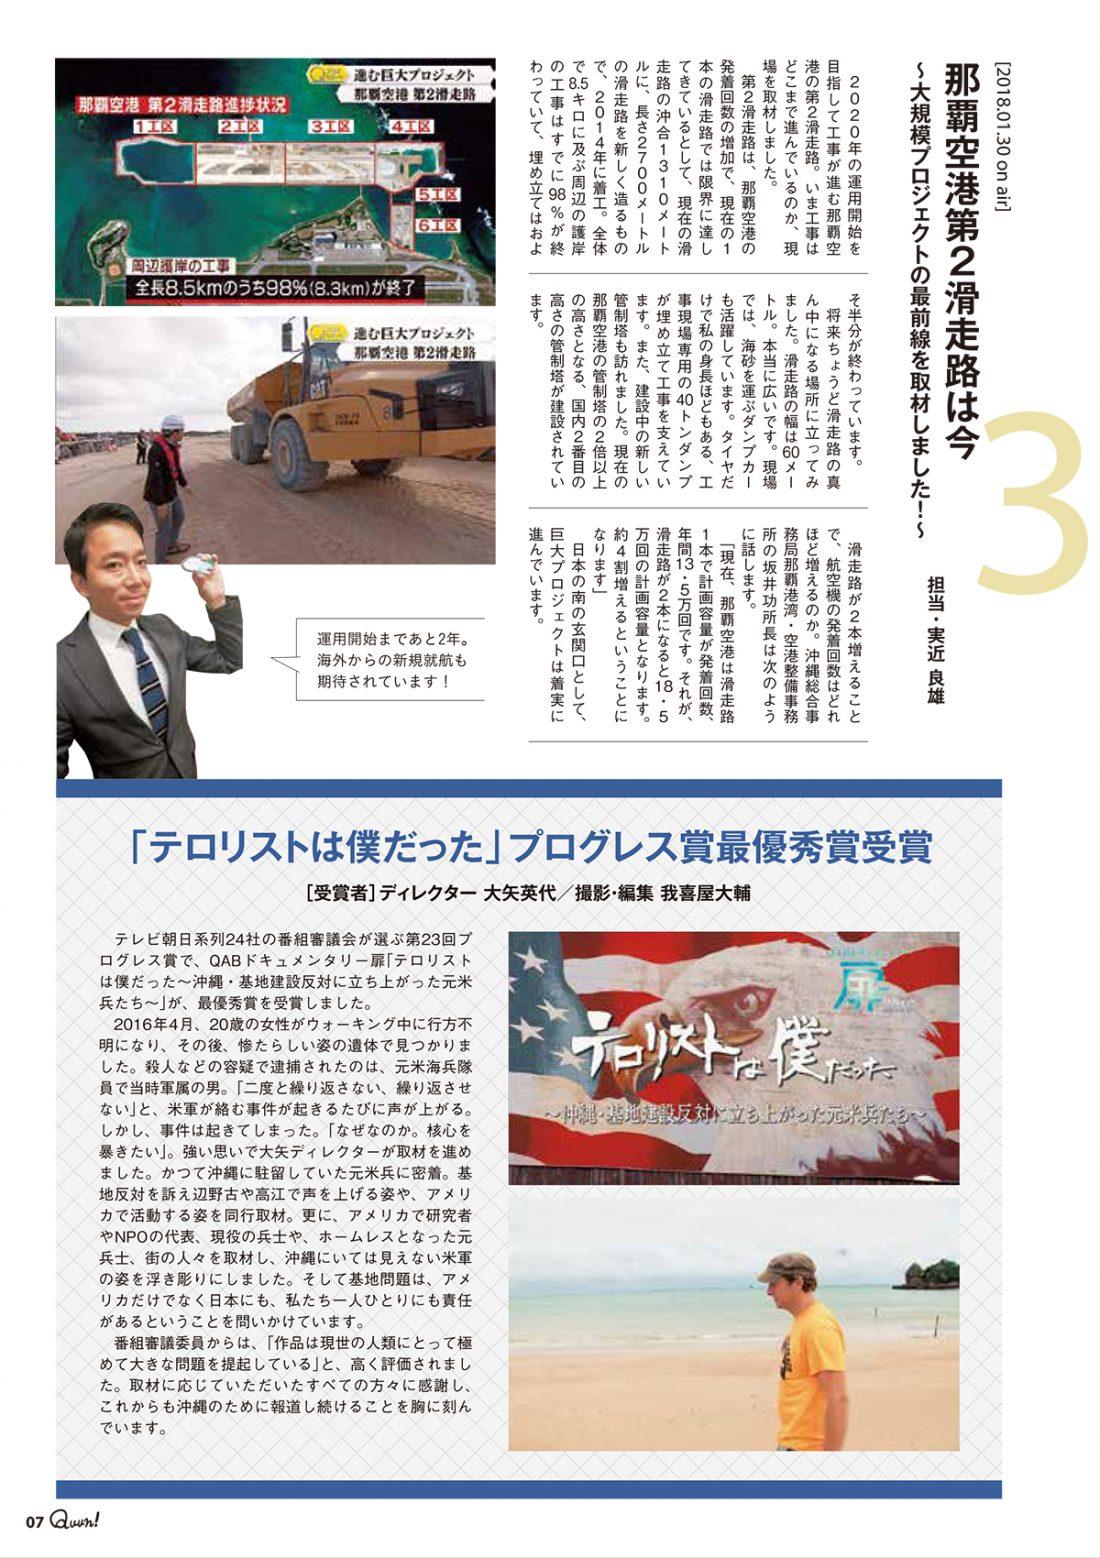 http://www.qab.co.jp/qgoro/wp-content/uploads/quun_0909-1100x1558.jpg